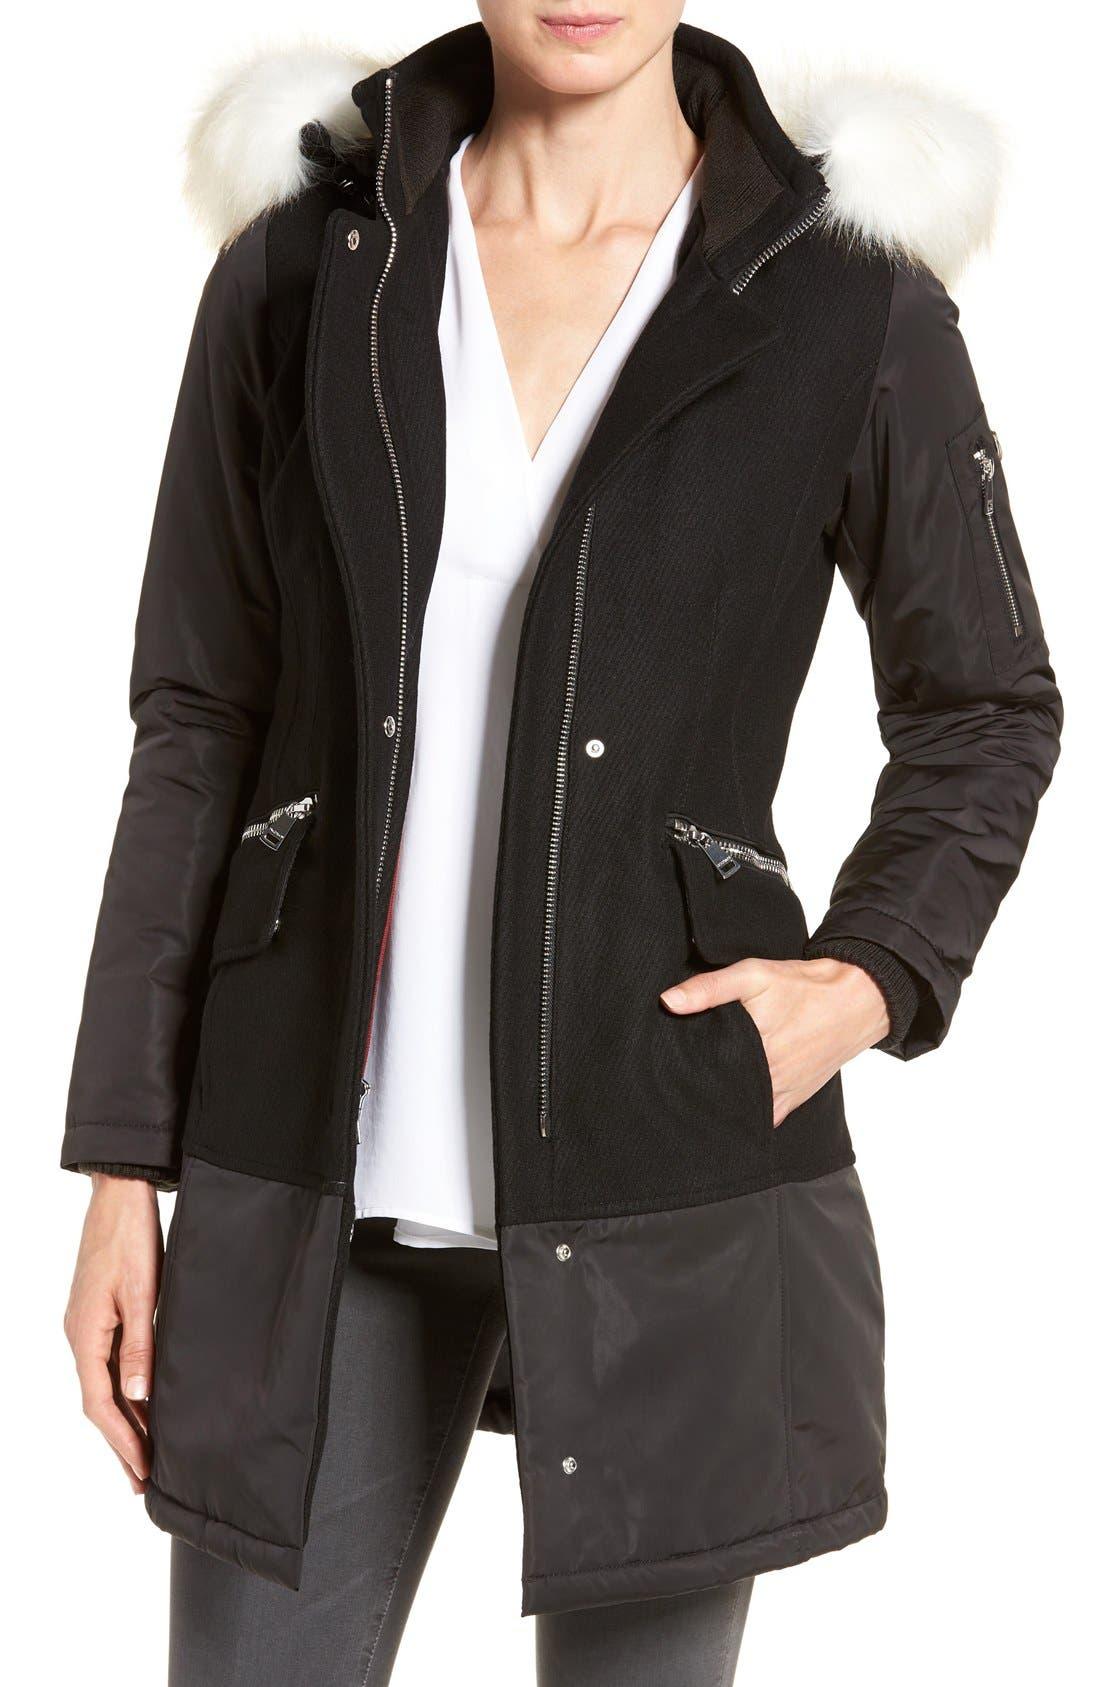 Alternate Image 1 Selected - 1 Madison Faux Fur Trim Mixed Media Drop Waist Coat